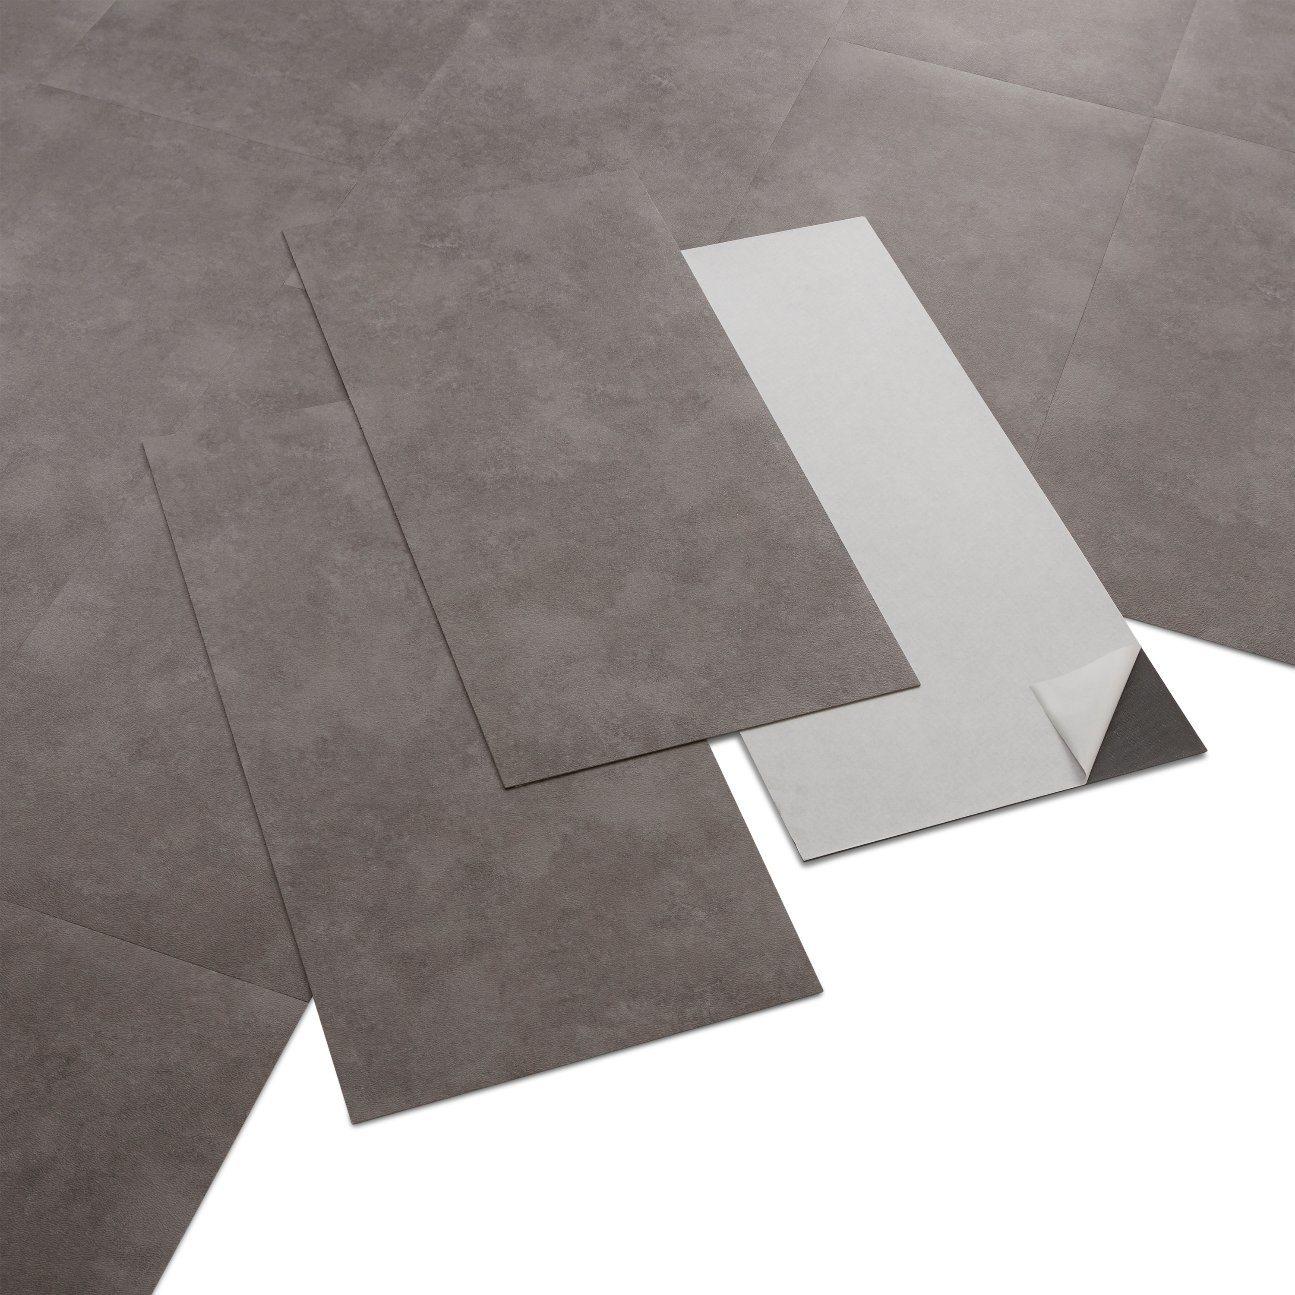 PVC (Vinyl) Floor Tile / Self Adhesive Tile/ Floor Tile/Flooring Tile